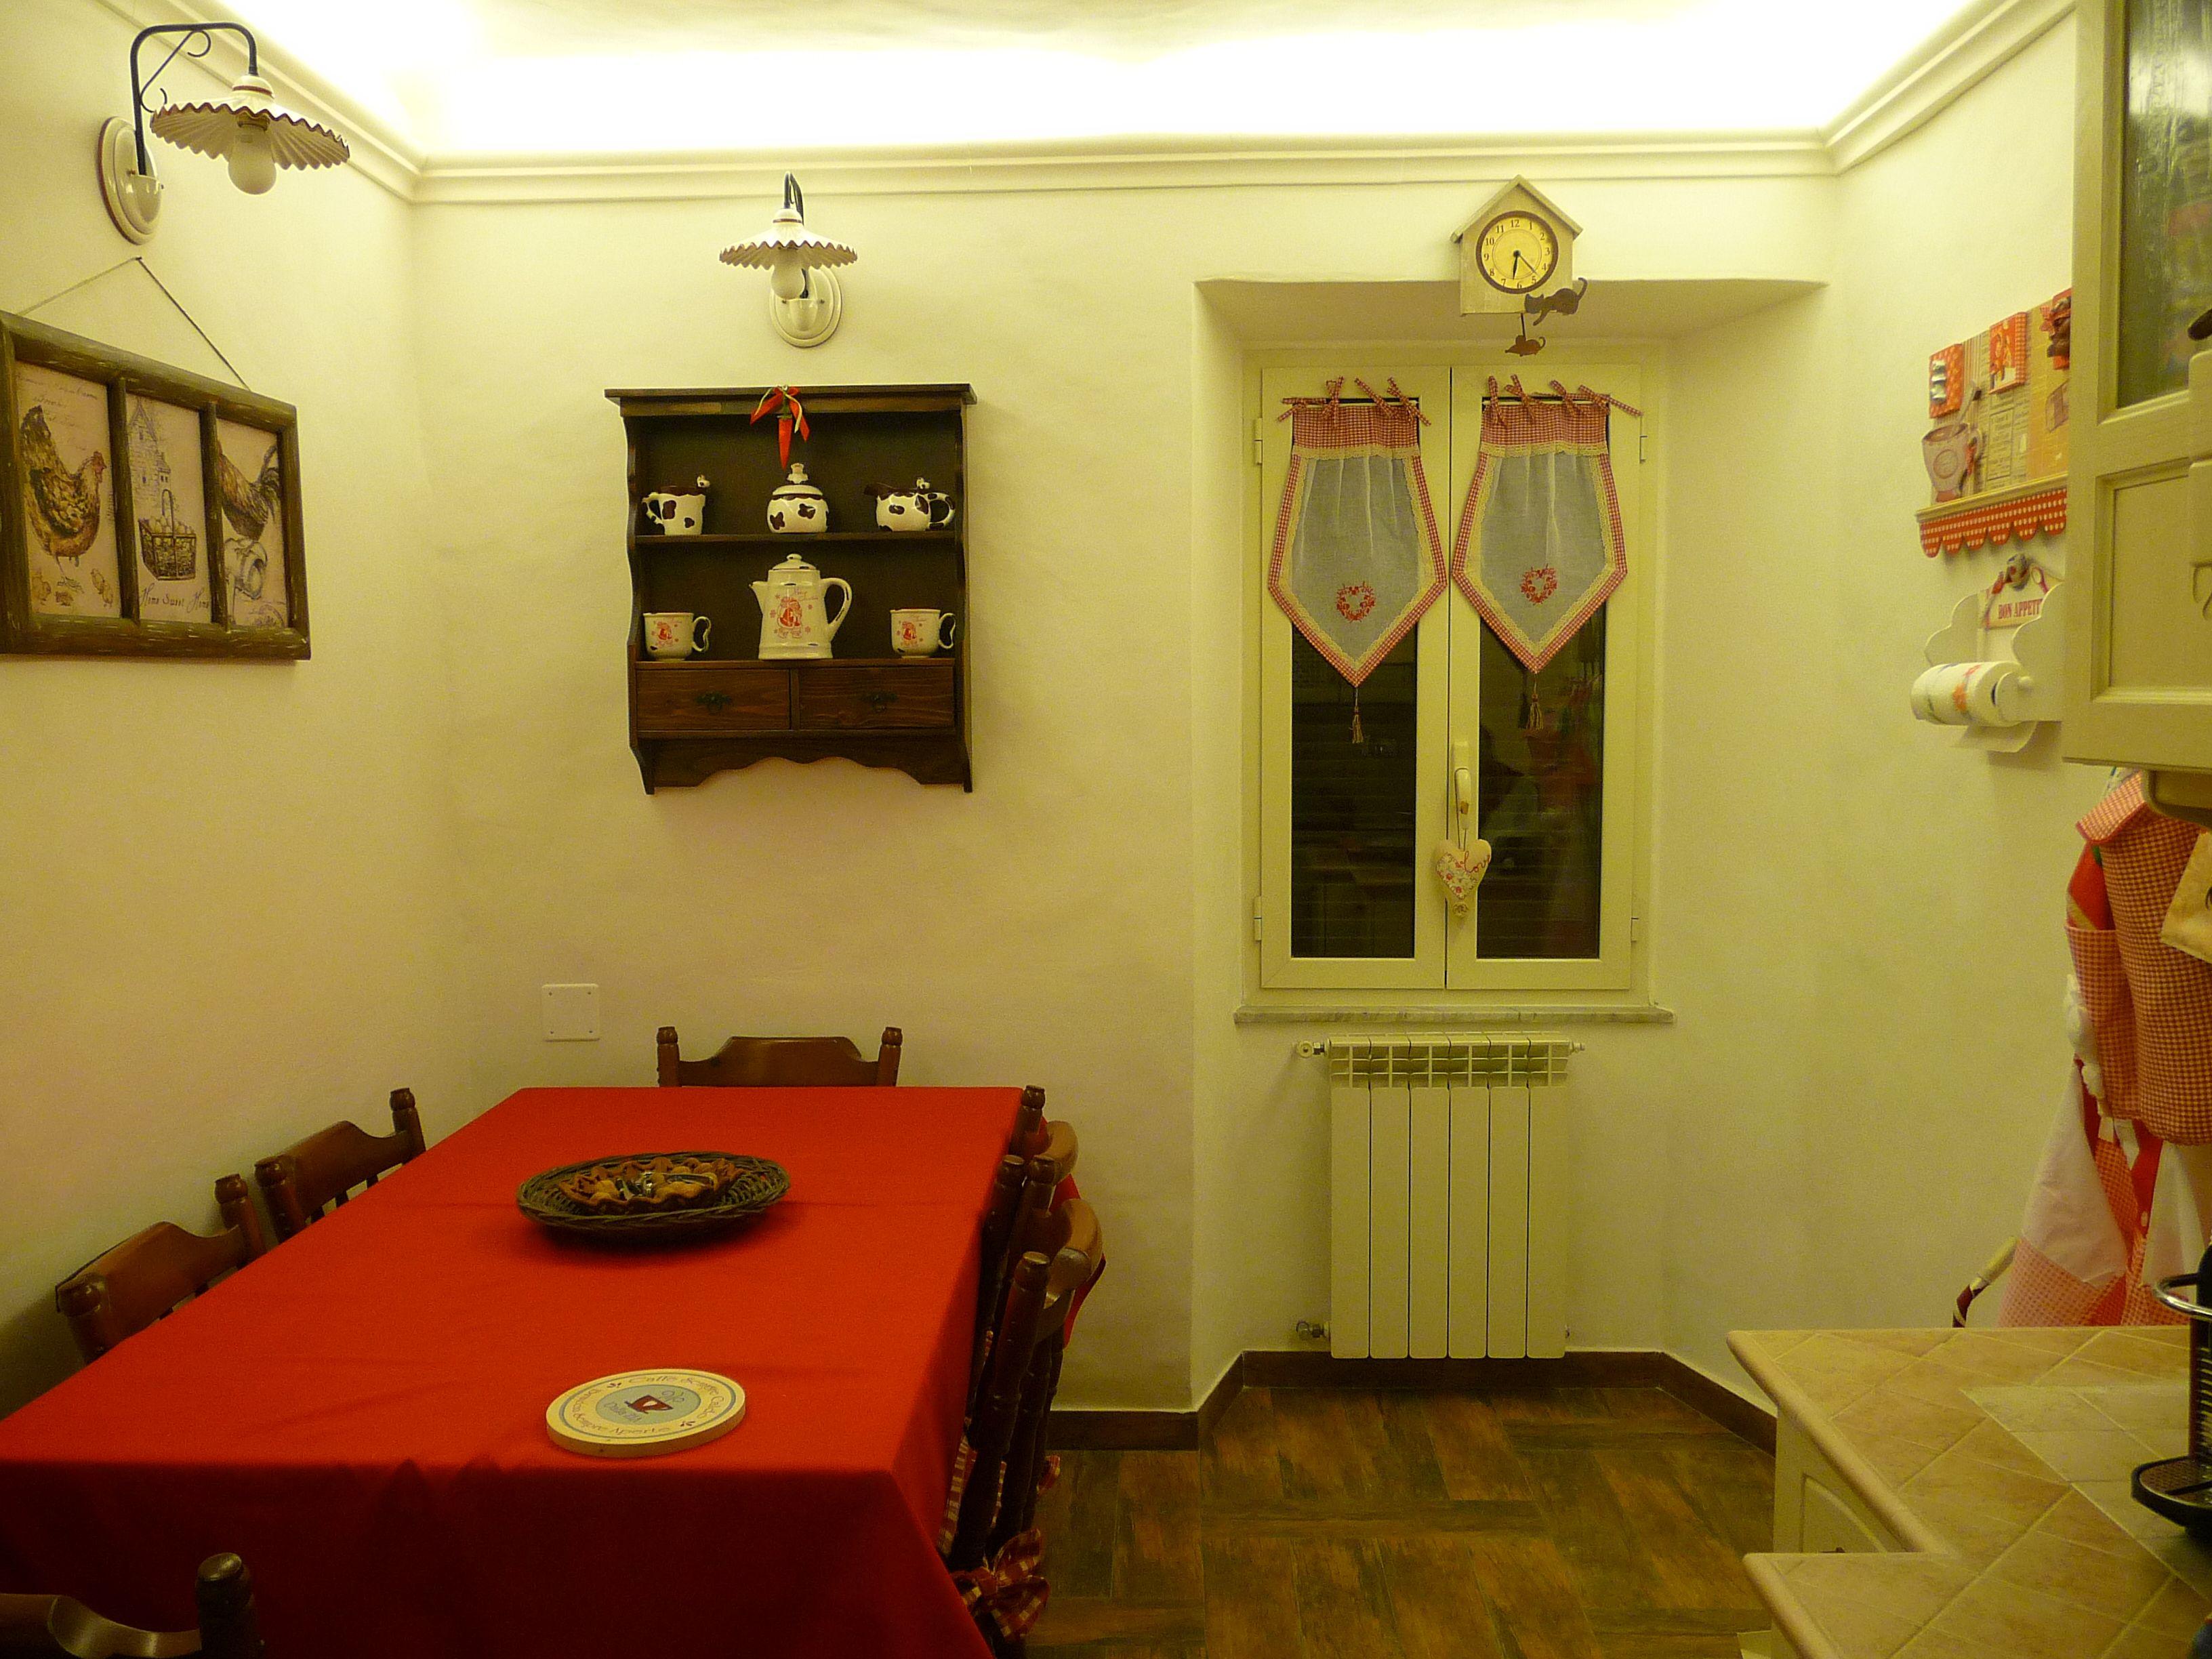 Cucine di montagna arredamento elegant casaalmare with - Cucine di montagna arredamento ...